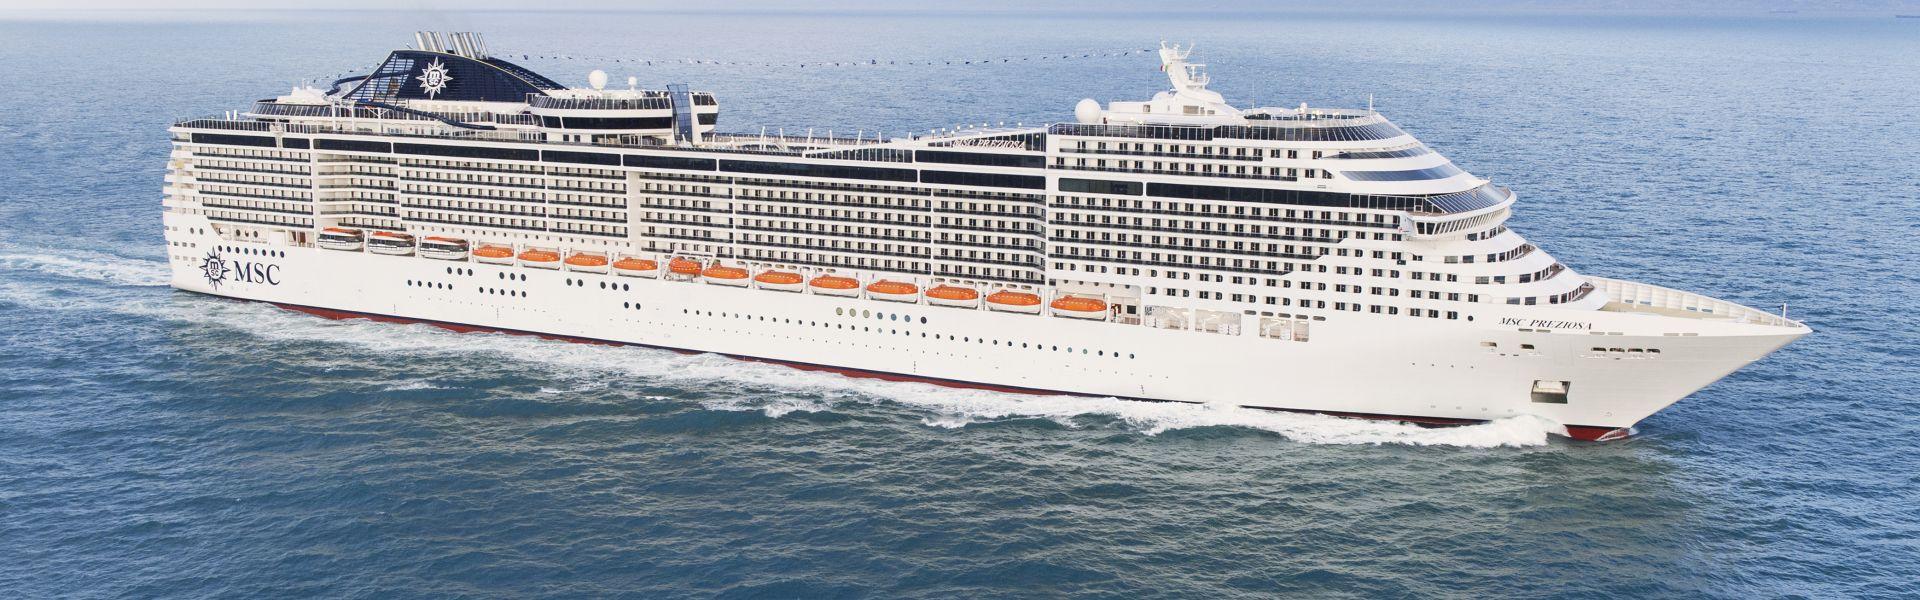 Croaziera de Grup Organizat cu Zbor Inclus 2018 - Lisabona, Maroc & Mediterana de Vest (Genova) - MSC Cruises - MSC Preziosa - 9 nopti